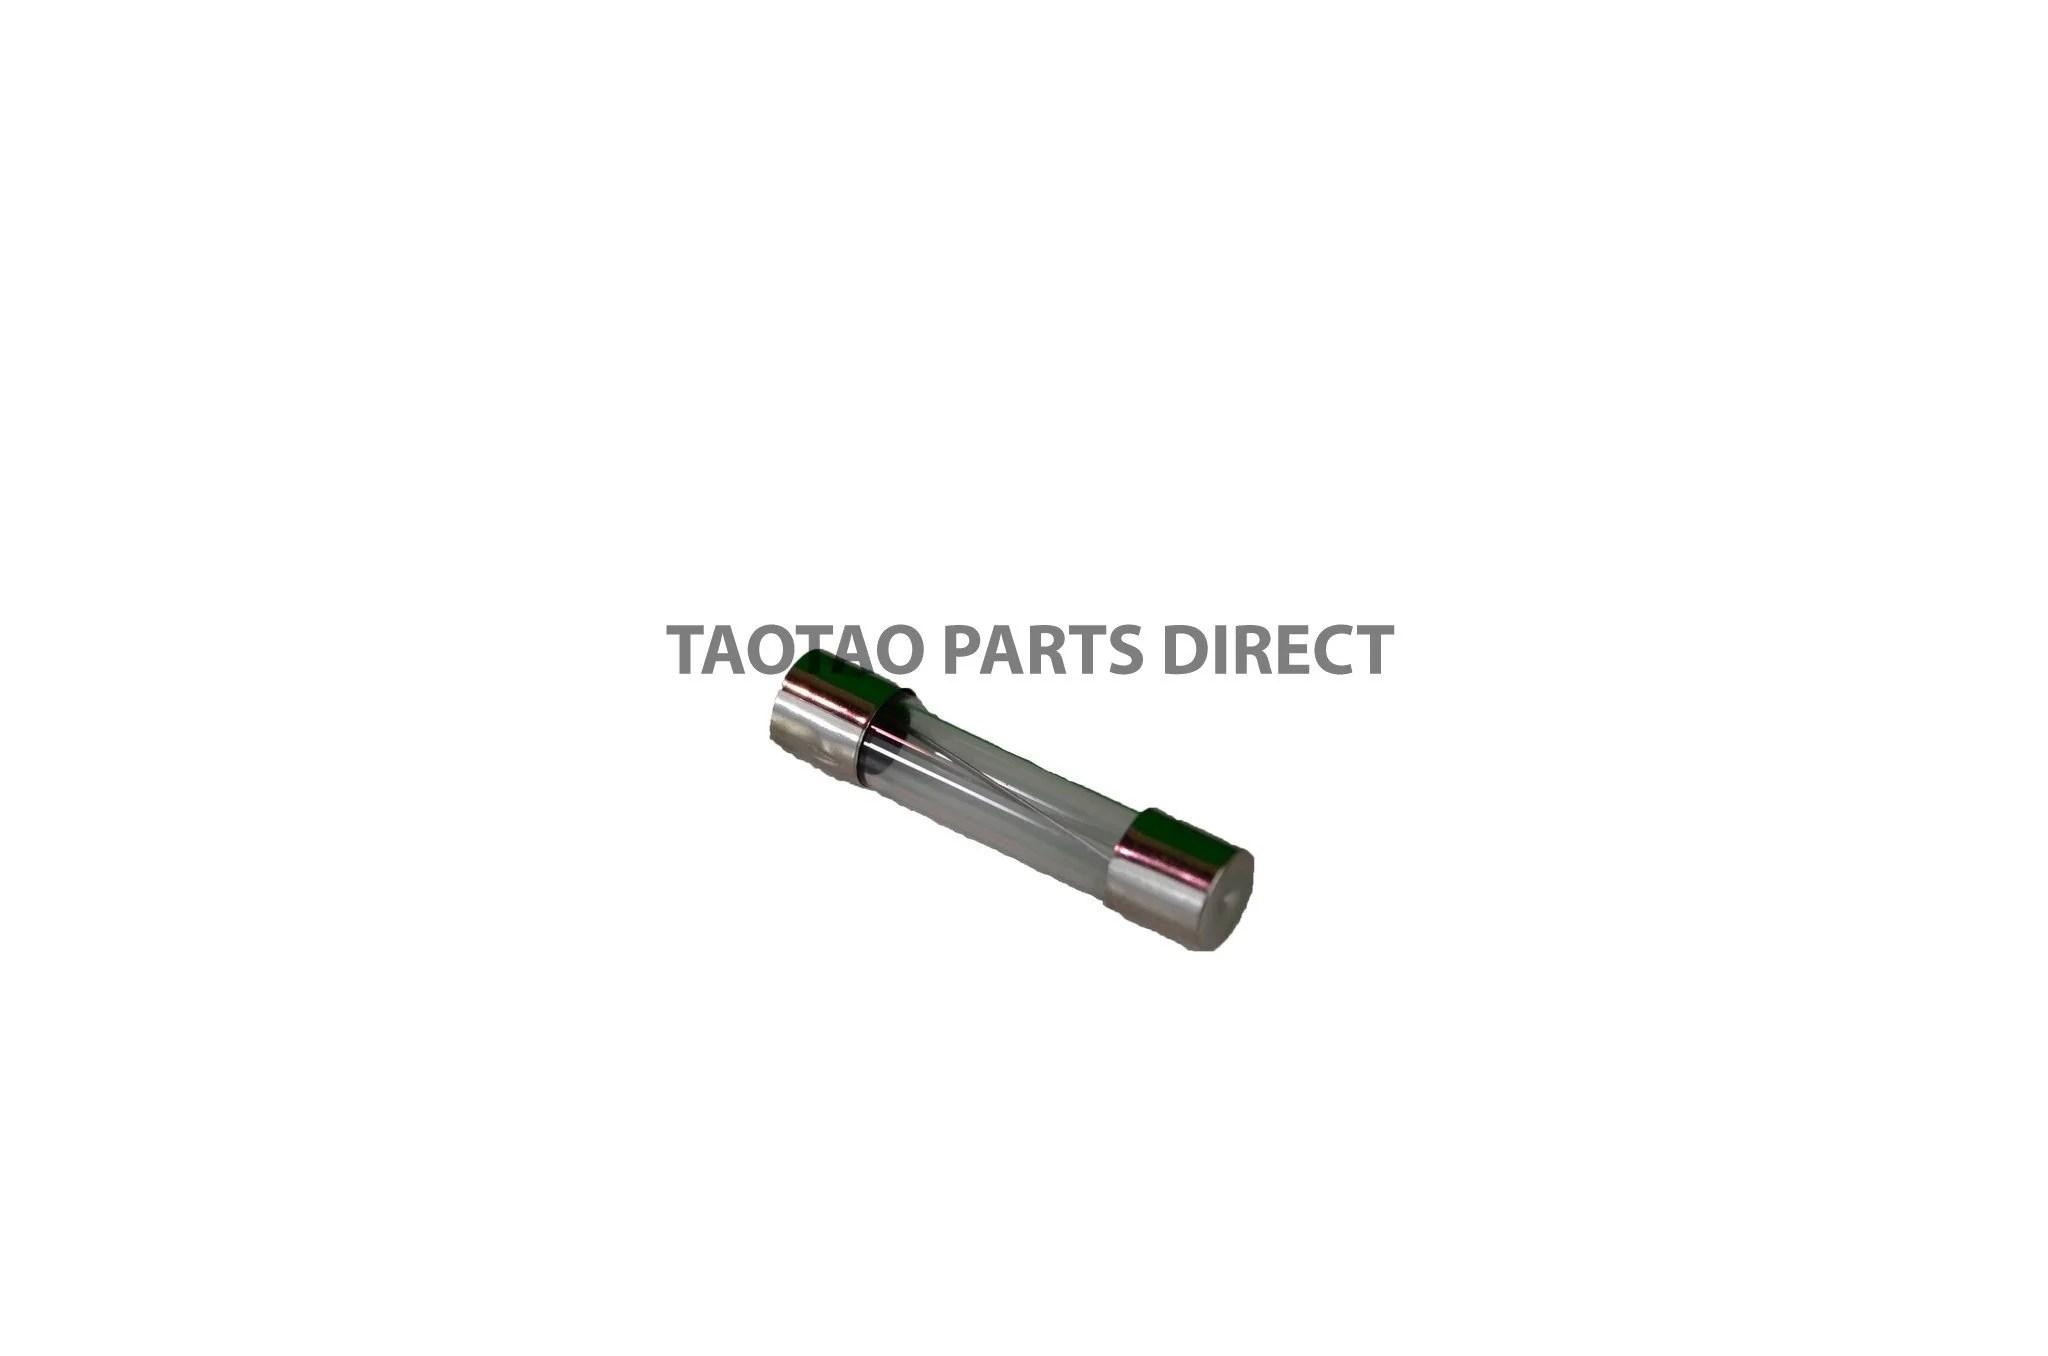 small resolution of taotao fuse box wiring diagram10ah glass fuse taotao parts direct10ah glass fuse taotaopartsdirect com